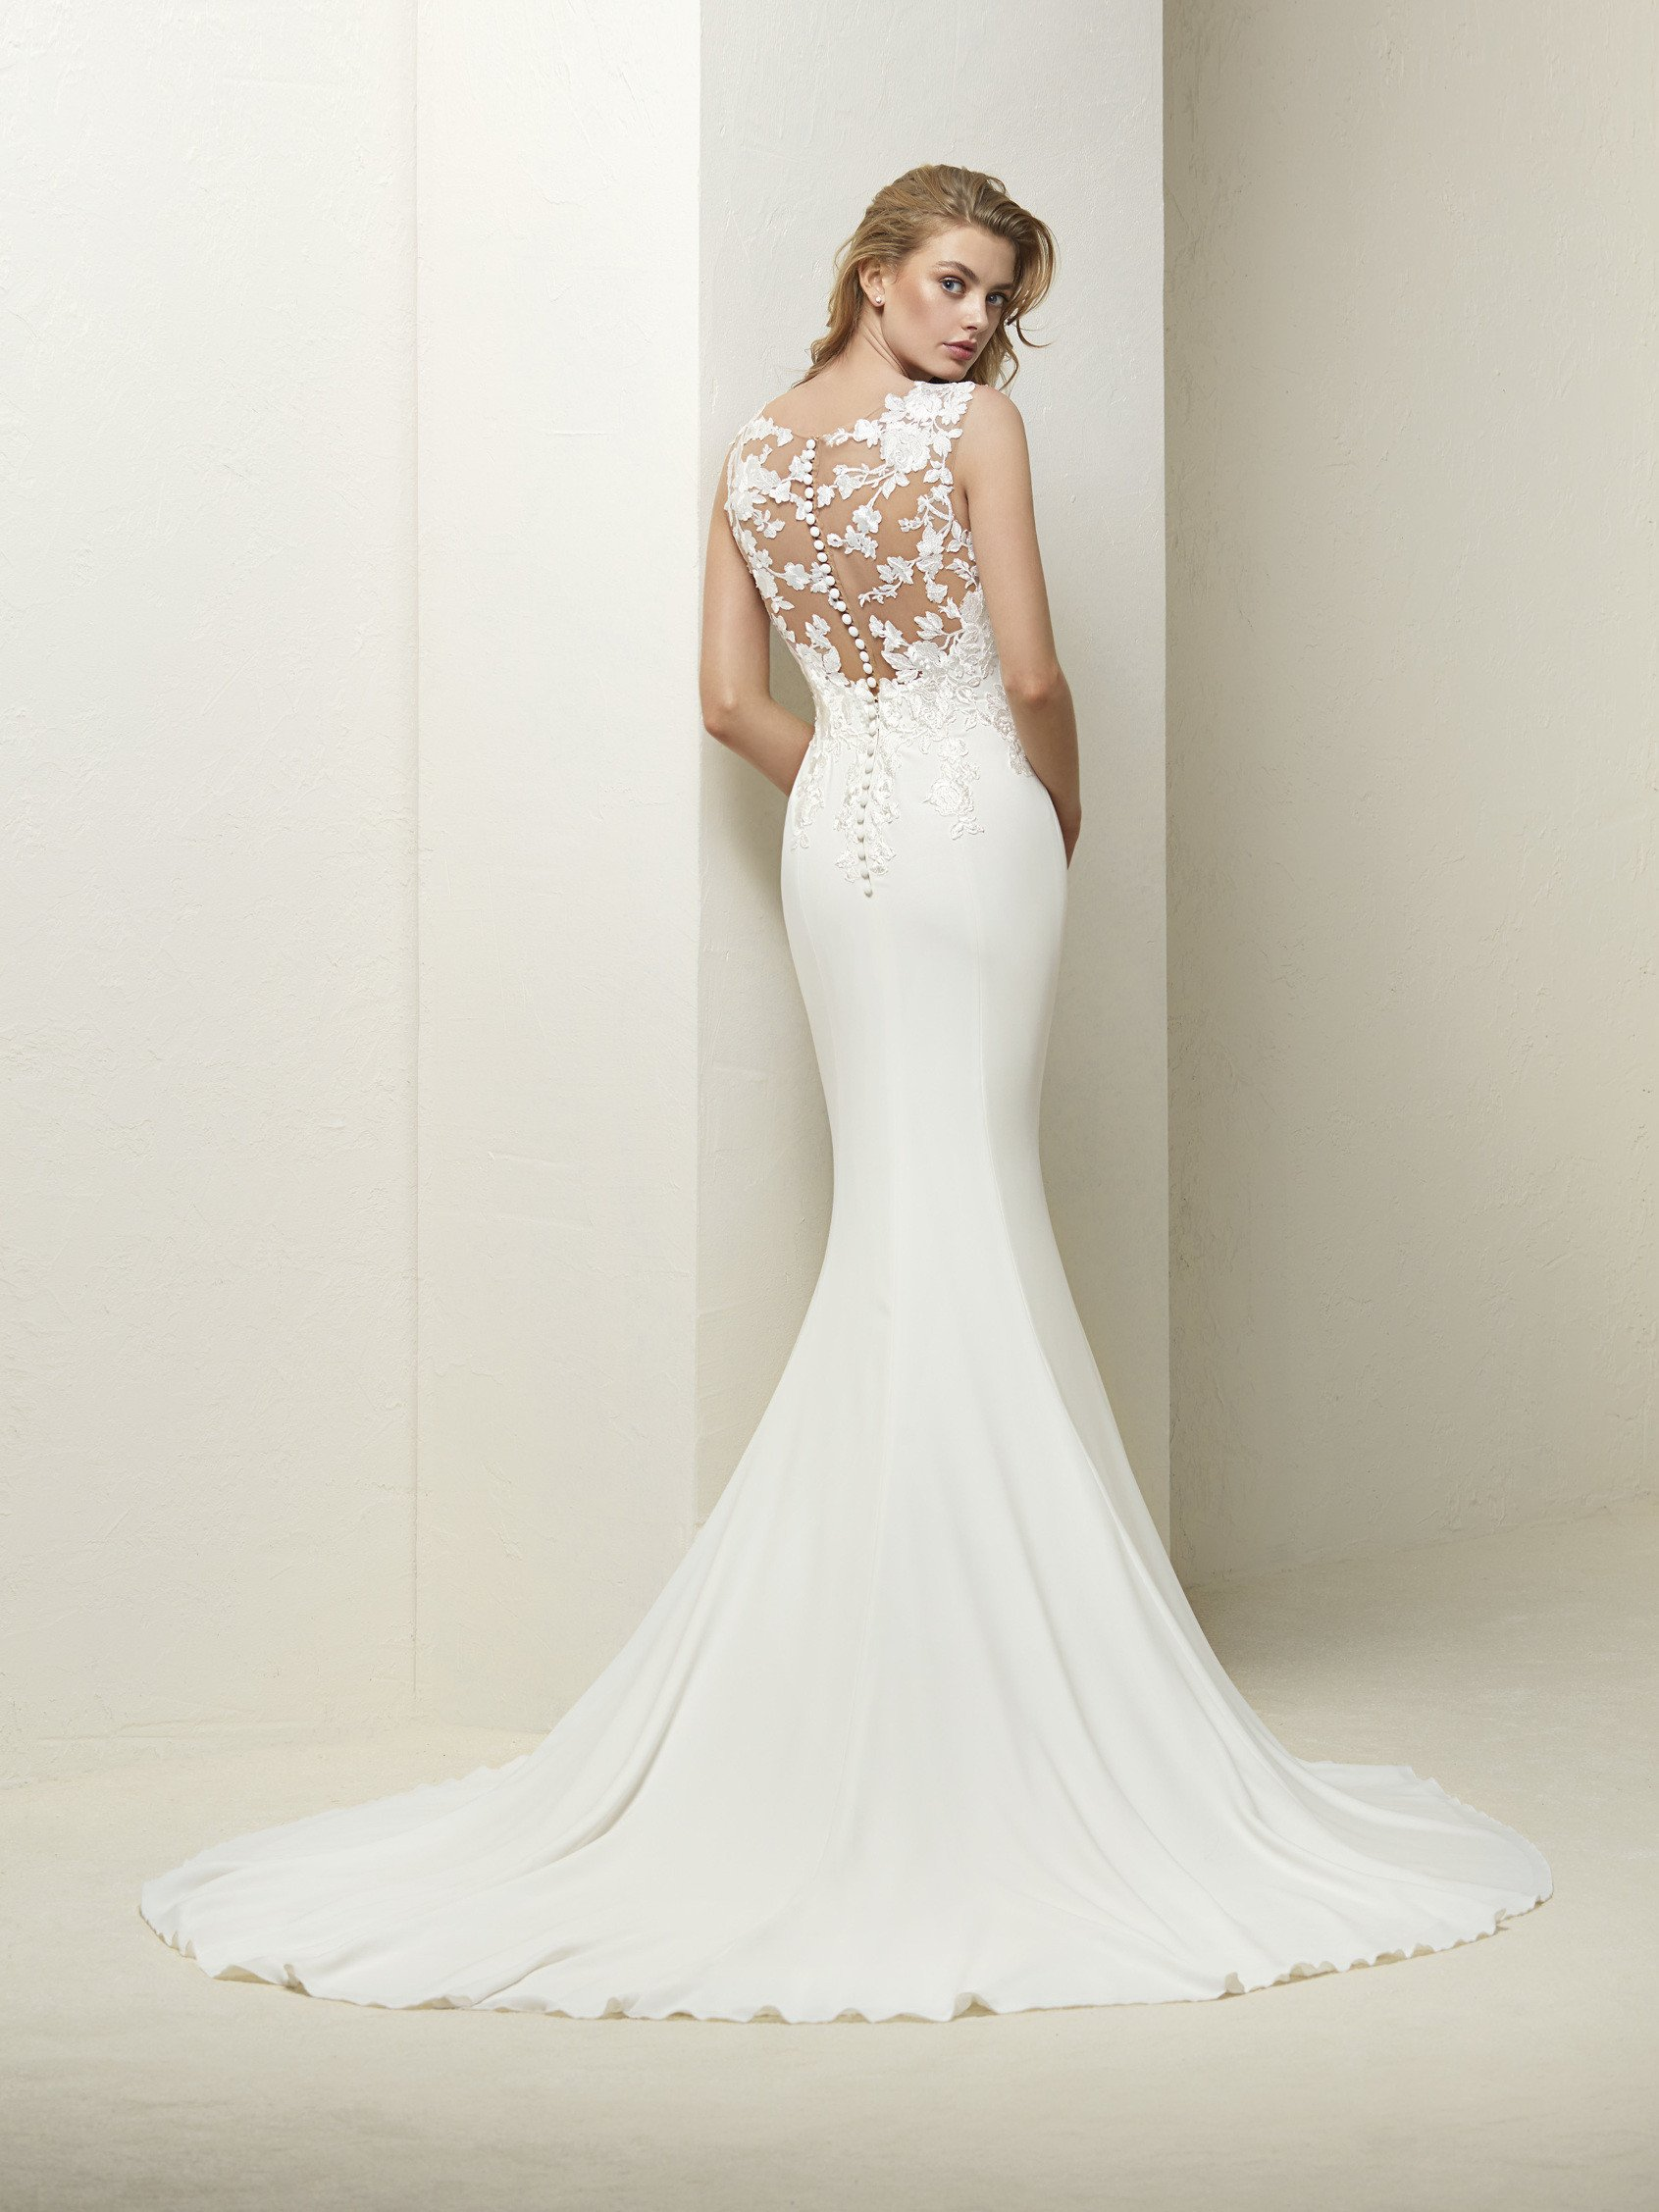 Pronovias wedding dresses Liverpool: Emma Bridal Wear.